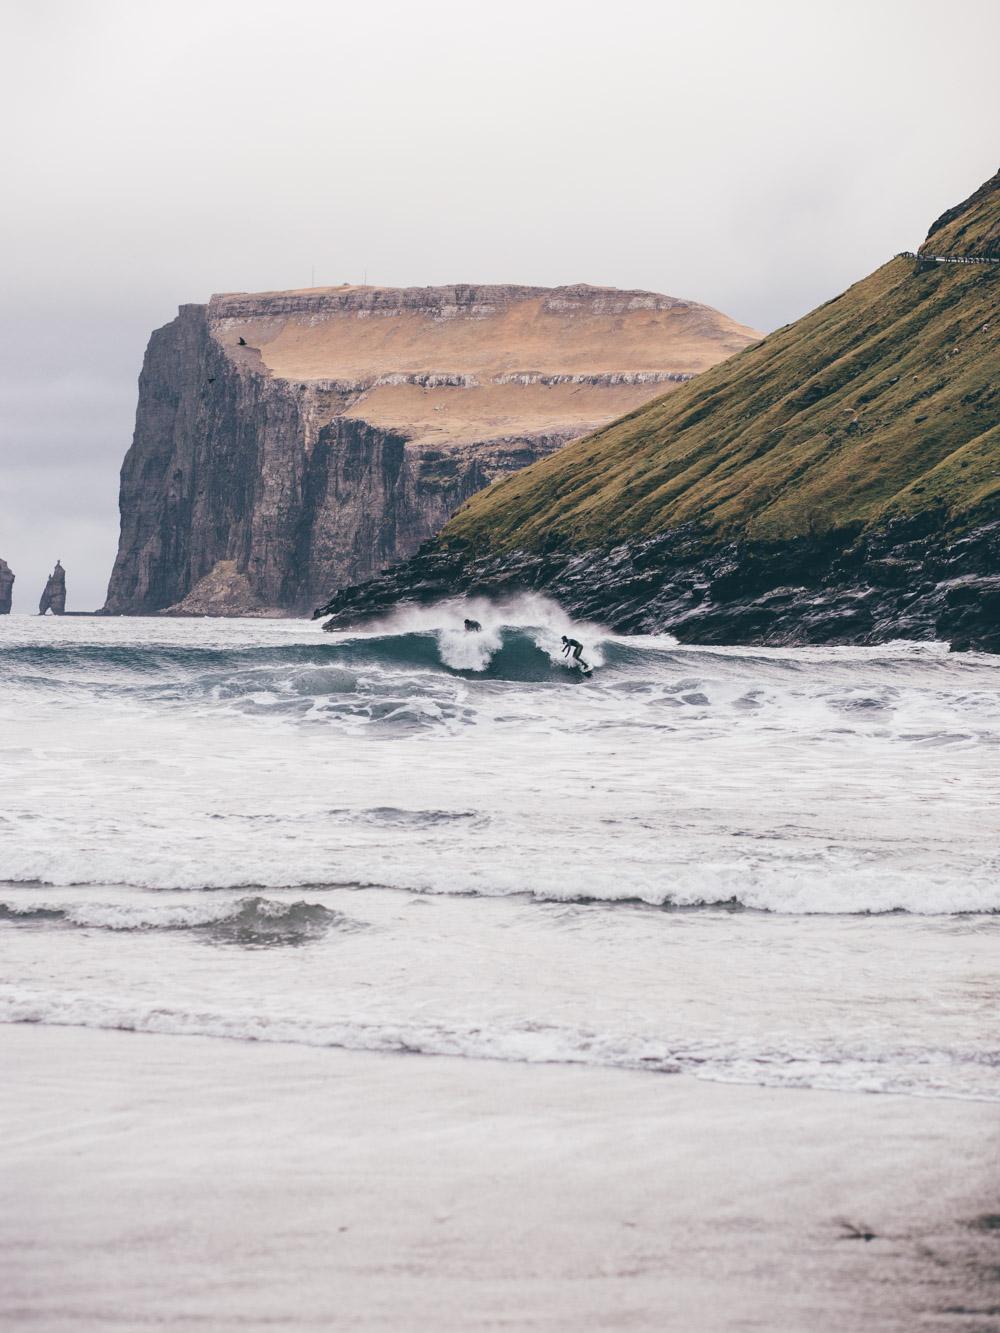 Faroe Islands Florian Besser Travel Färör Inseln Reise Foto Surfen Surfing